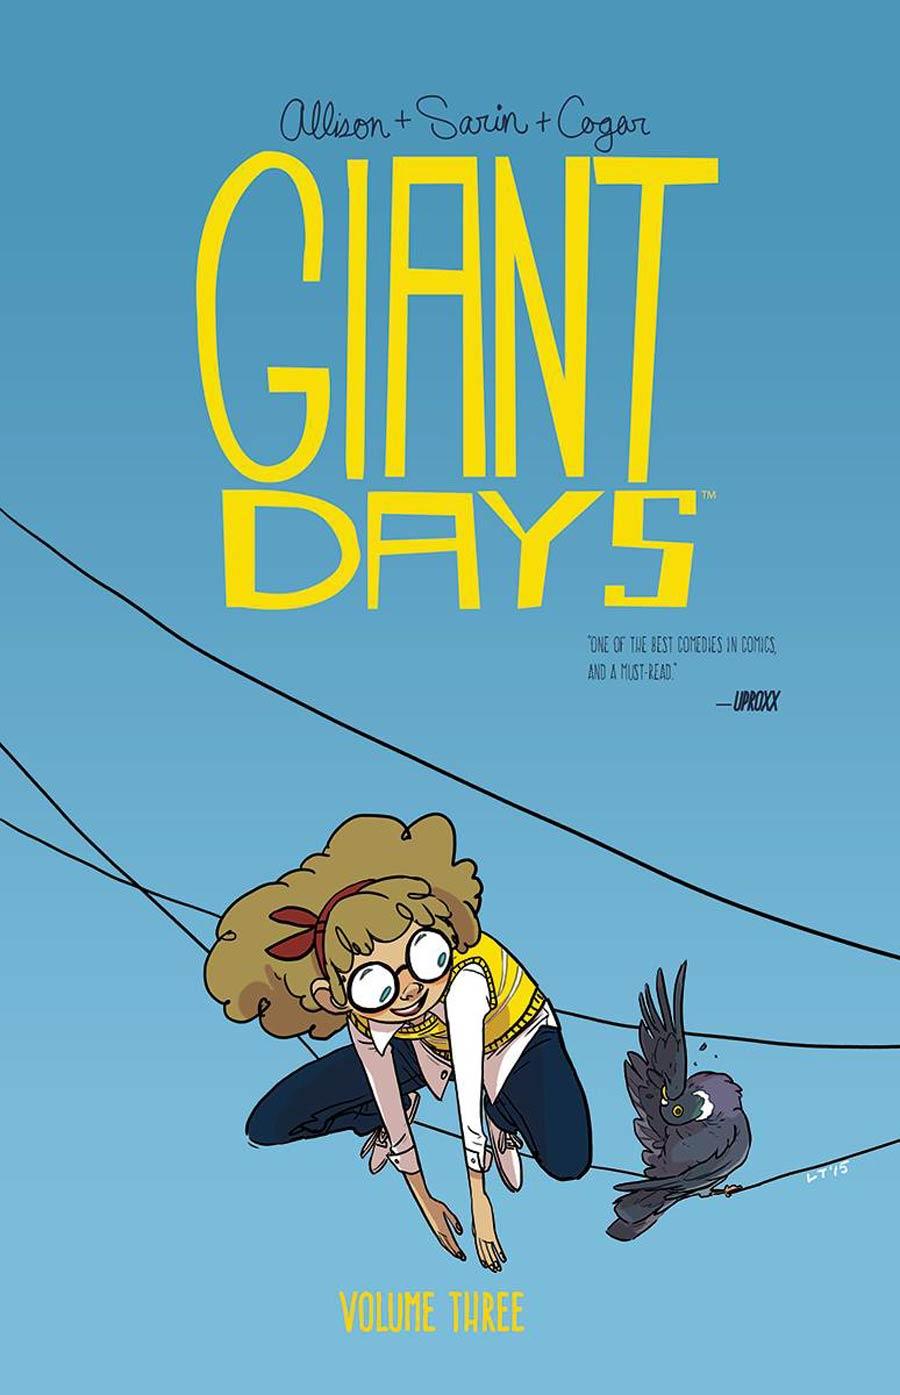 Giant Days Vol 3 TP